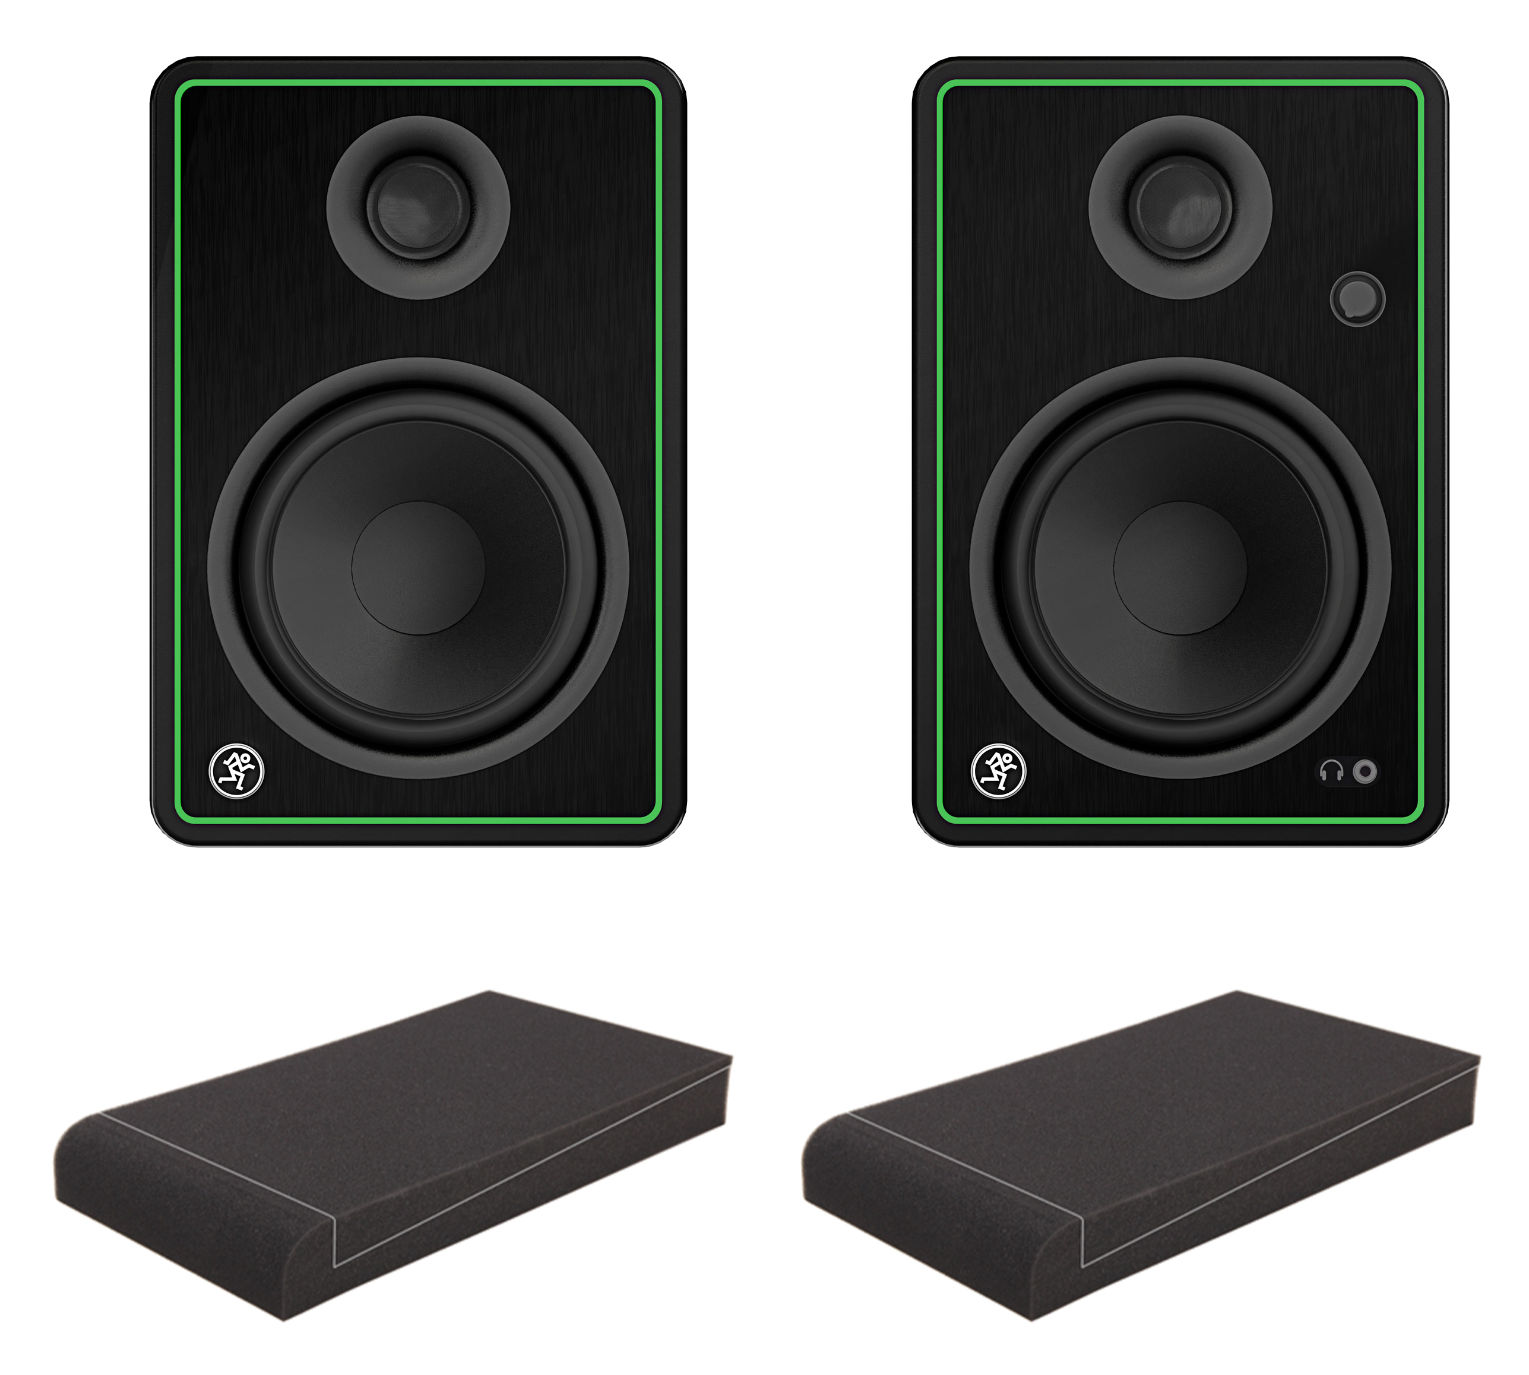 Studiomonitore - Mackie CR5 X ISO Set - Onlineshop Musikhaus Kirstein